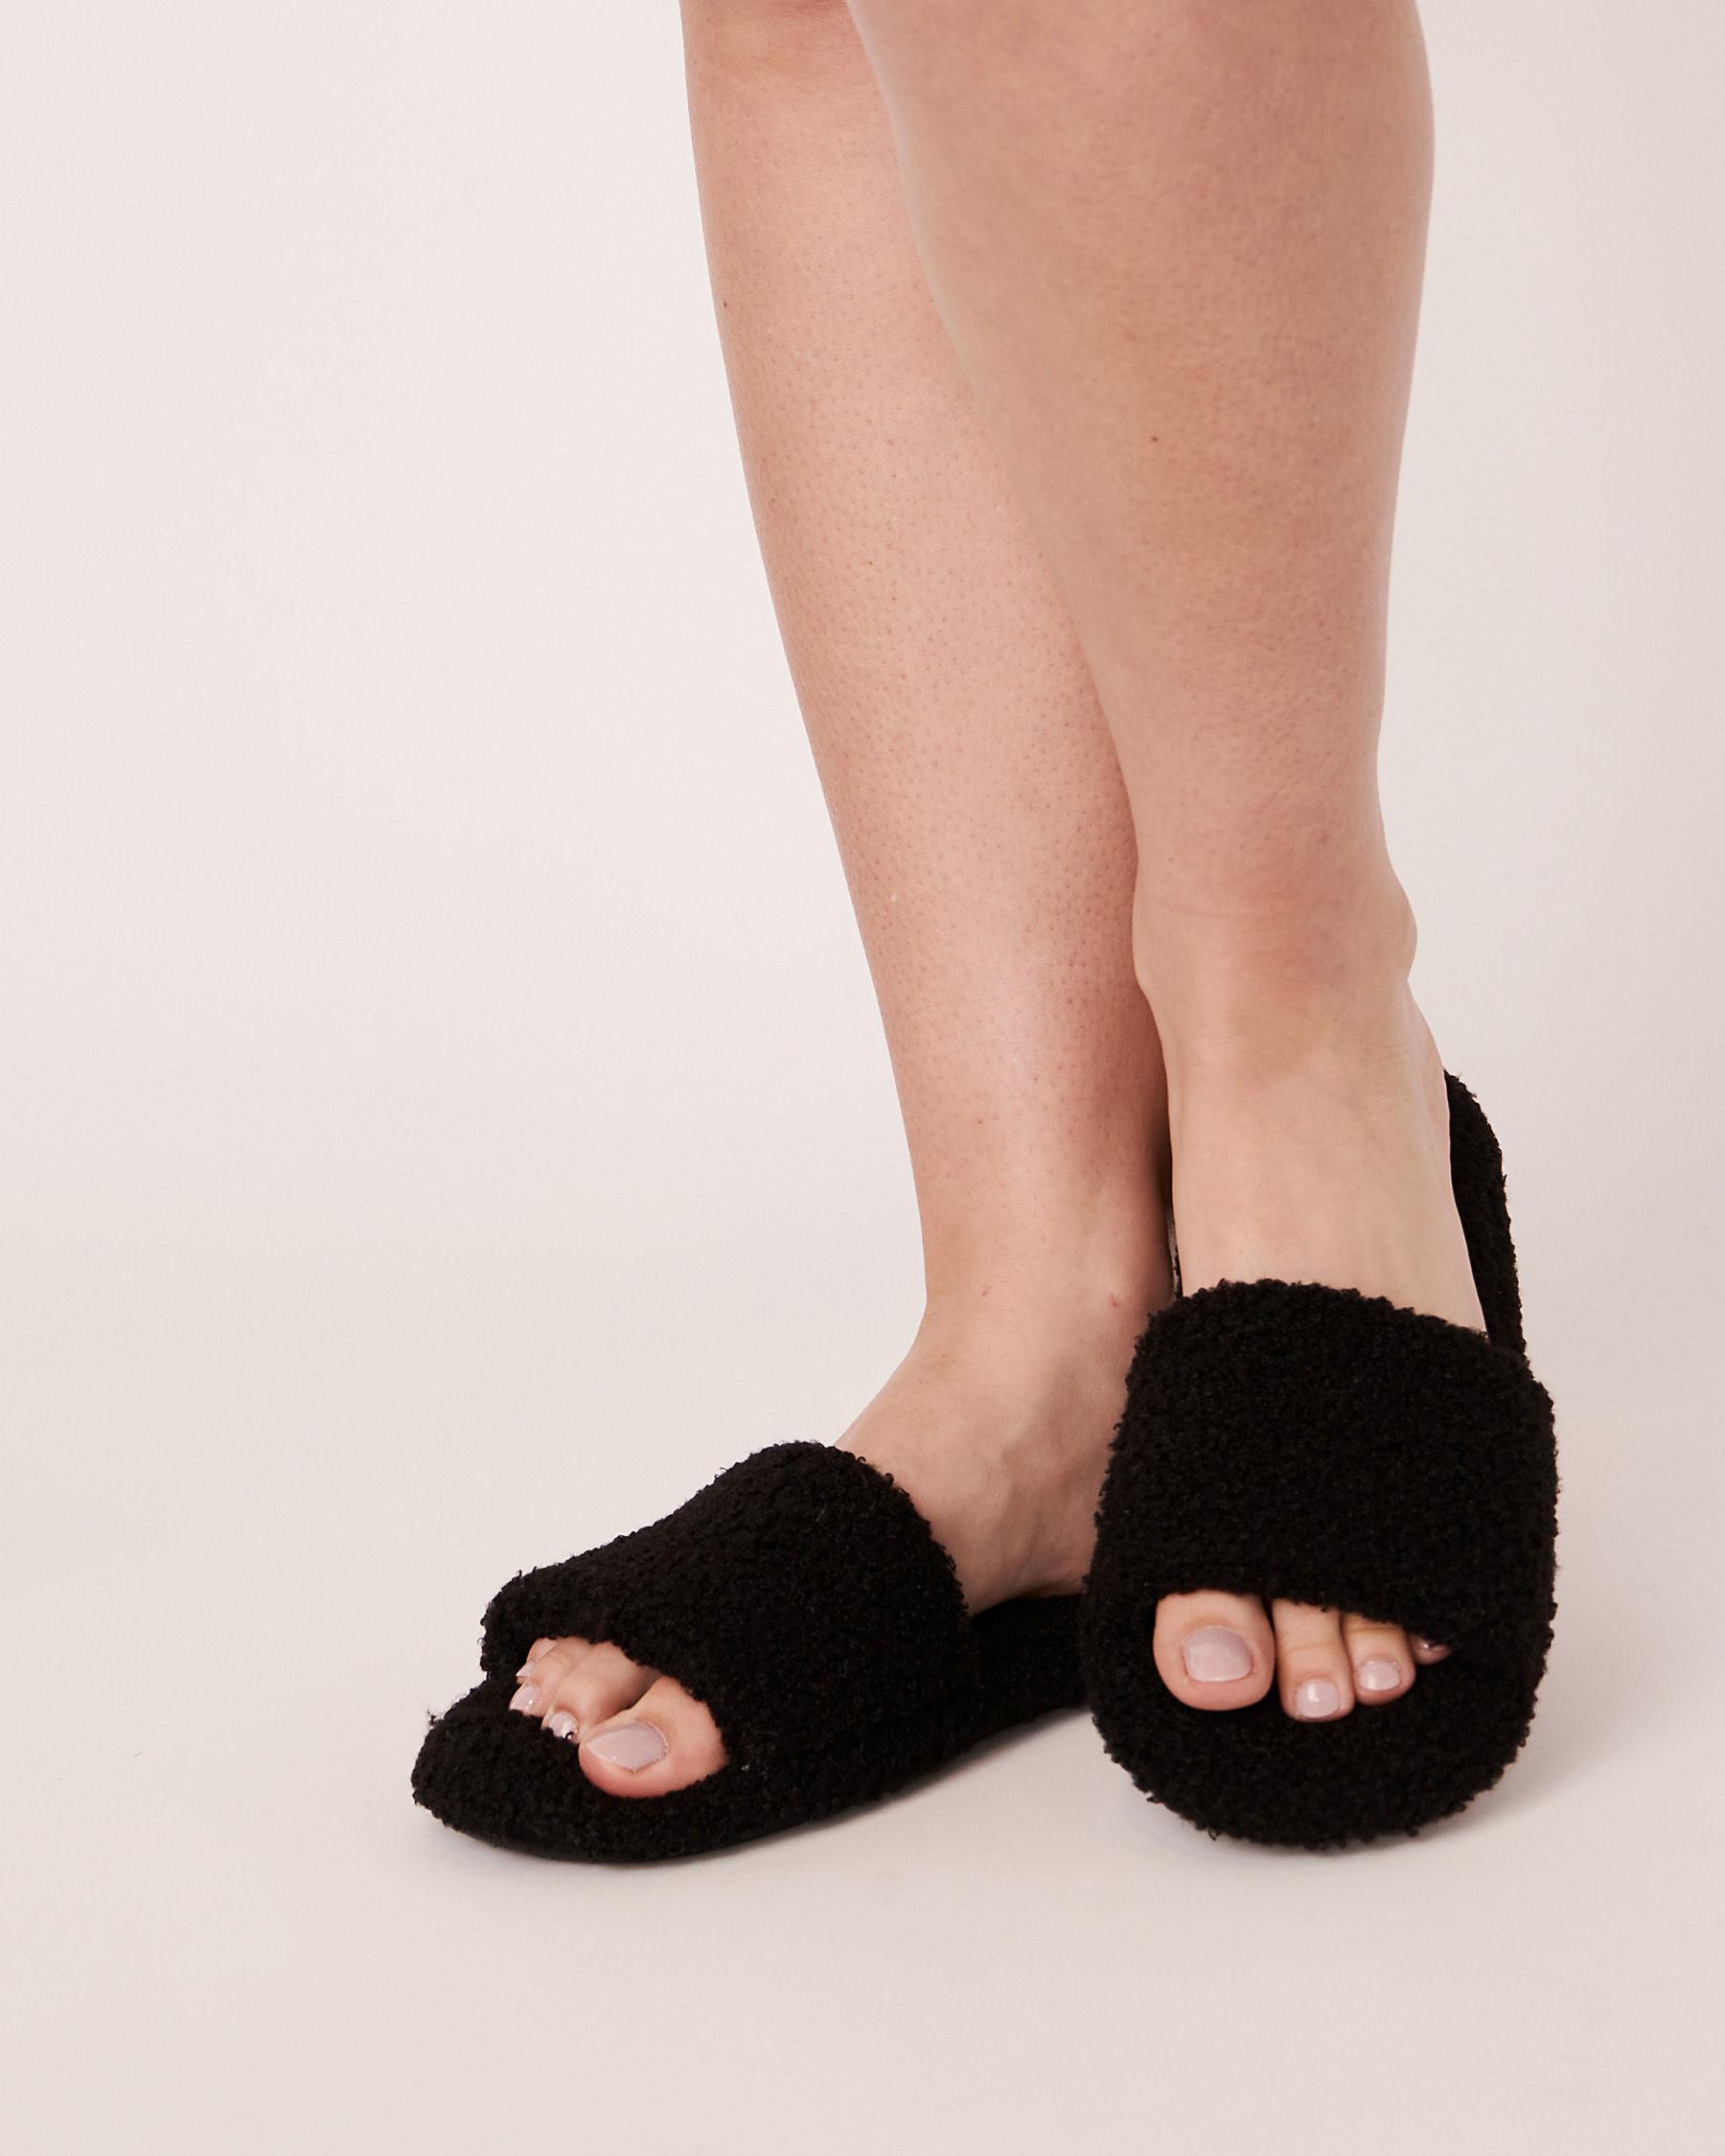 LA VIE EN ROSE Plush Open Slide Slippers Black 40700061 - View1